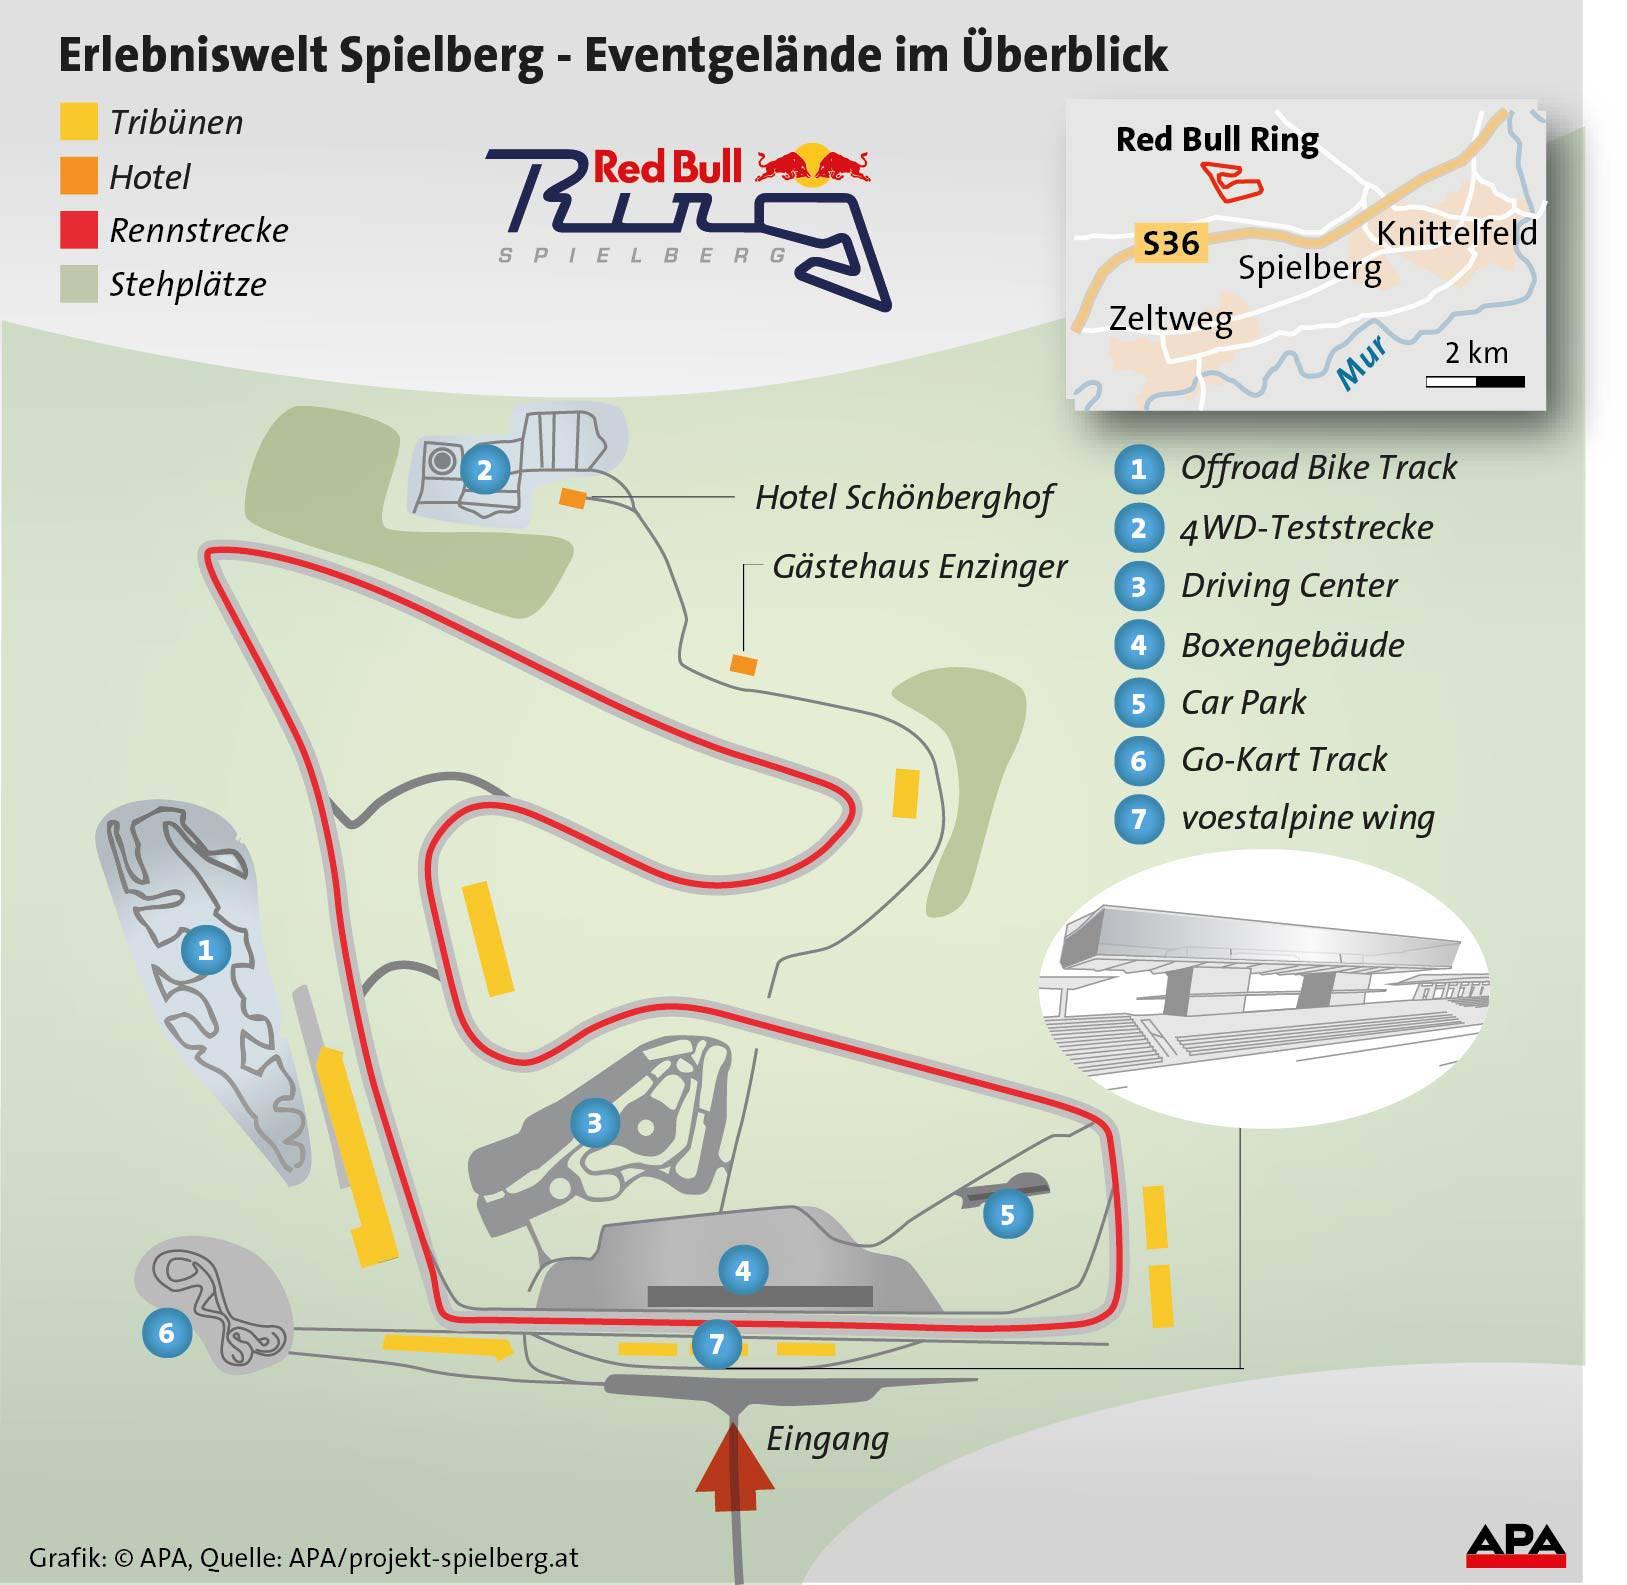 _Formel-1-Strecke in Spielbe... - APA-InfoGrafiken - 17.06.14 - 12.09 - AGD0006 - High-Res